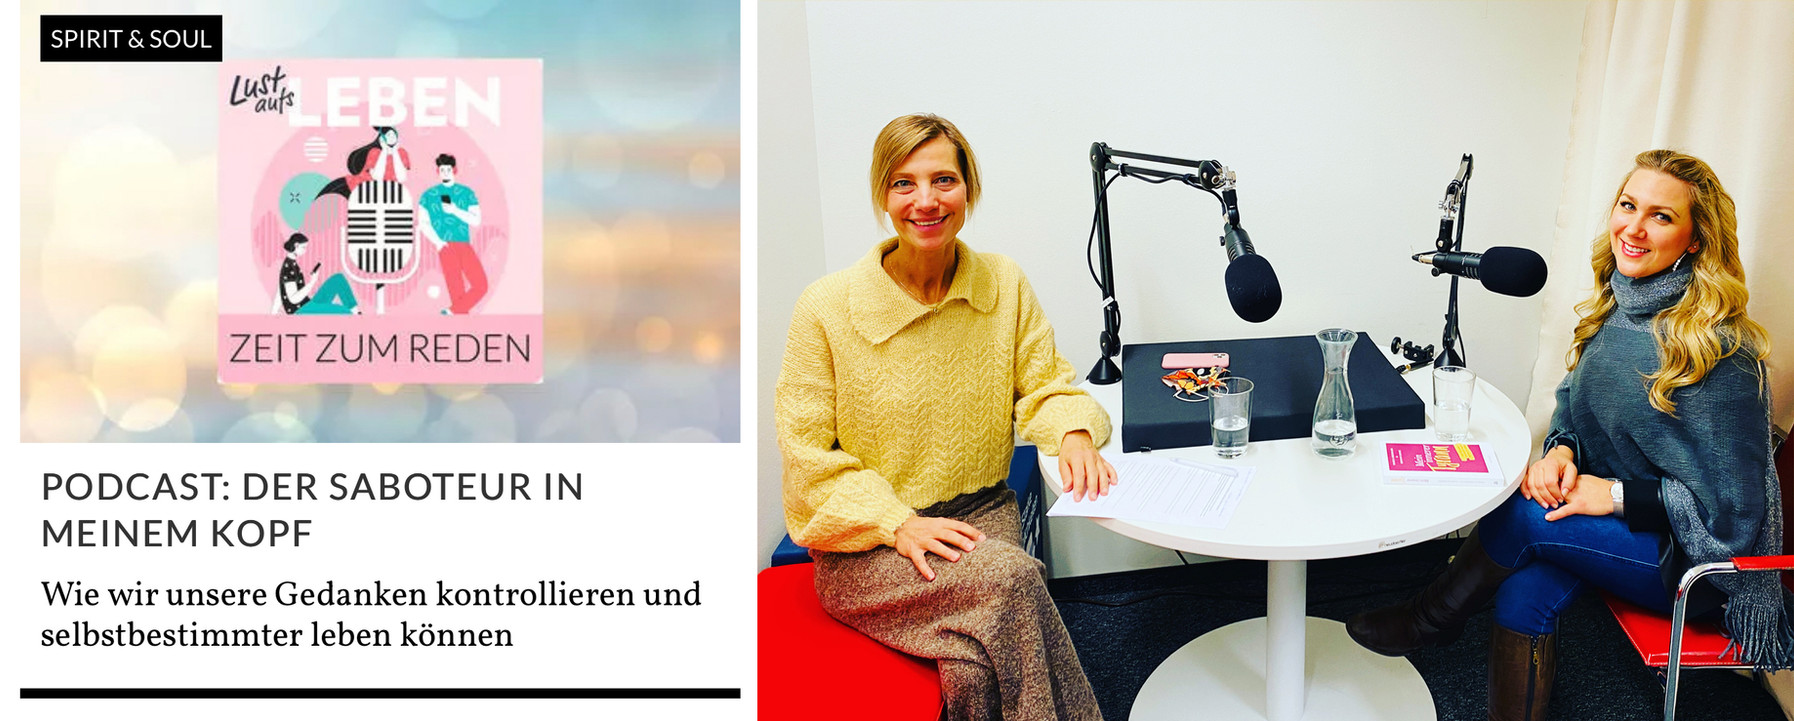 Podcast »Lust aufs LEBEN«